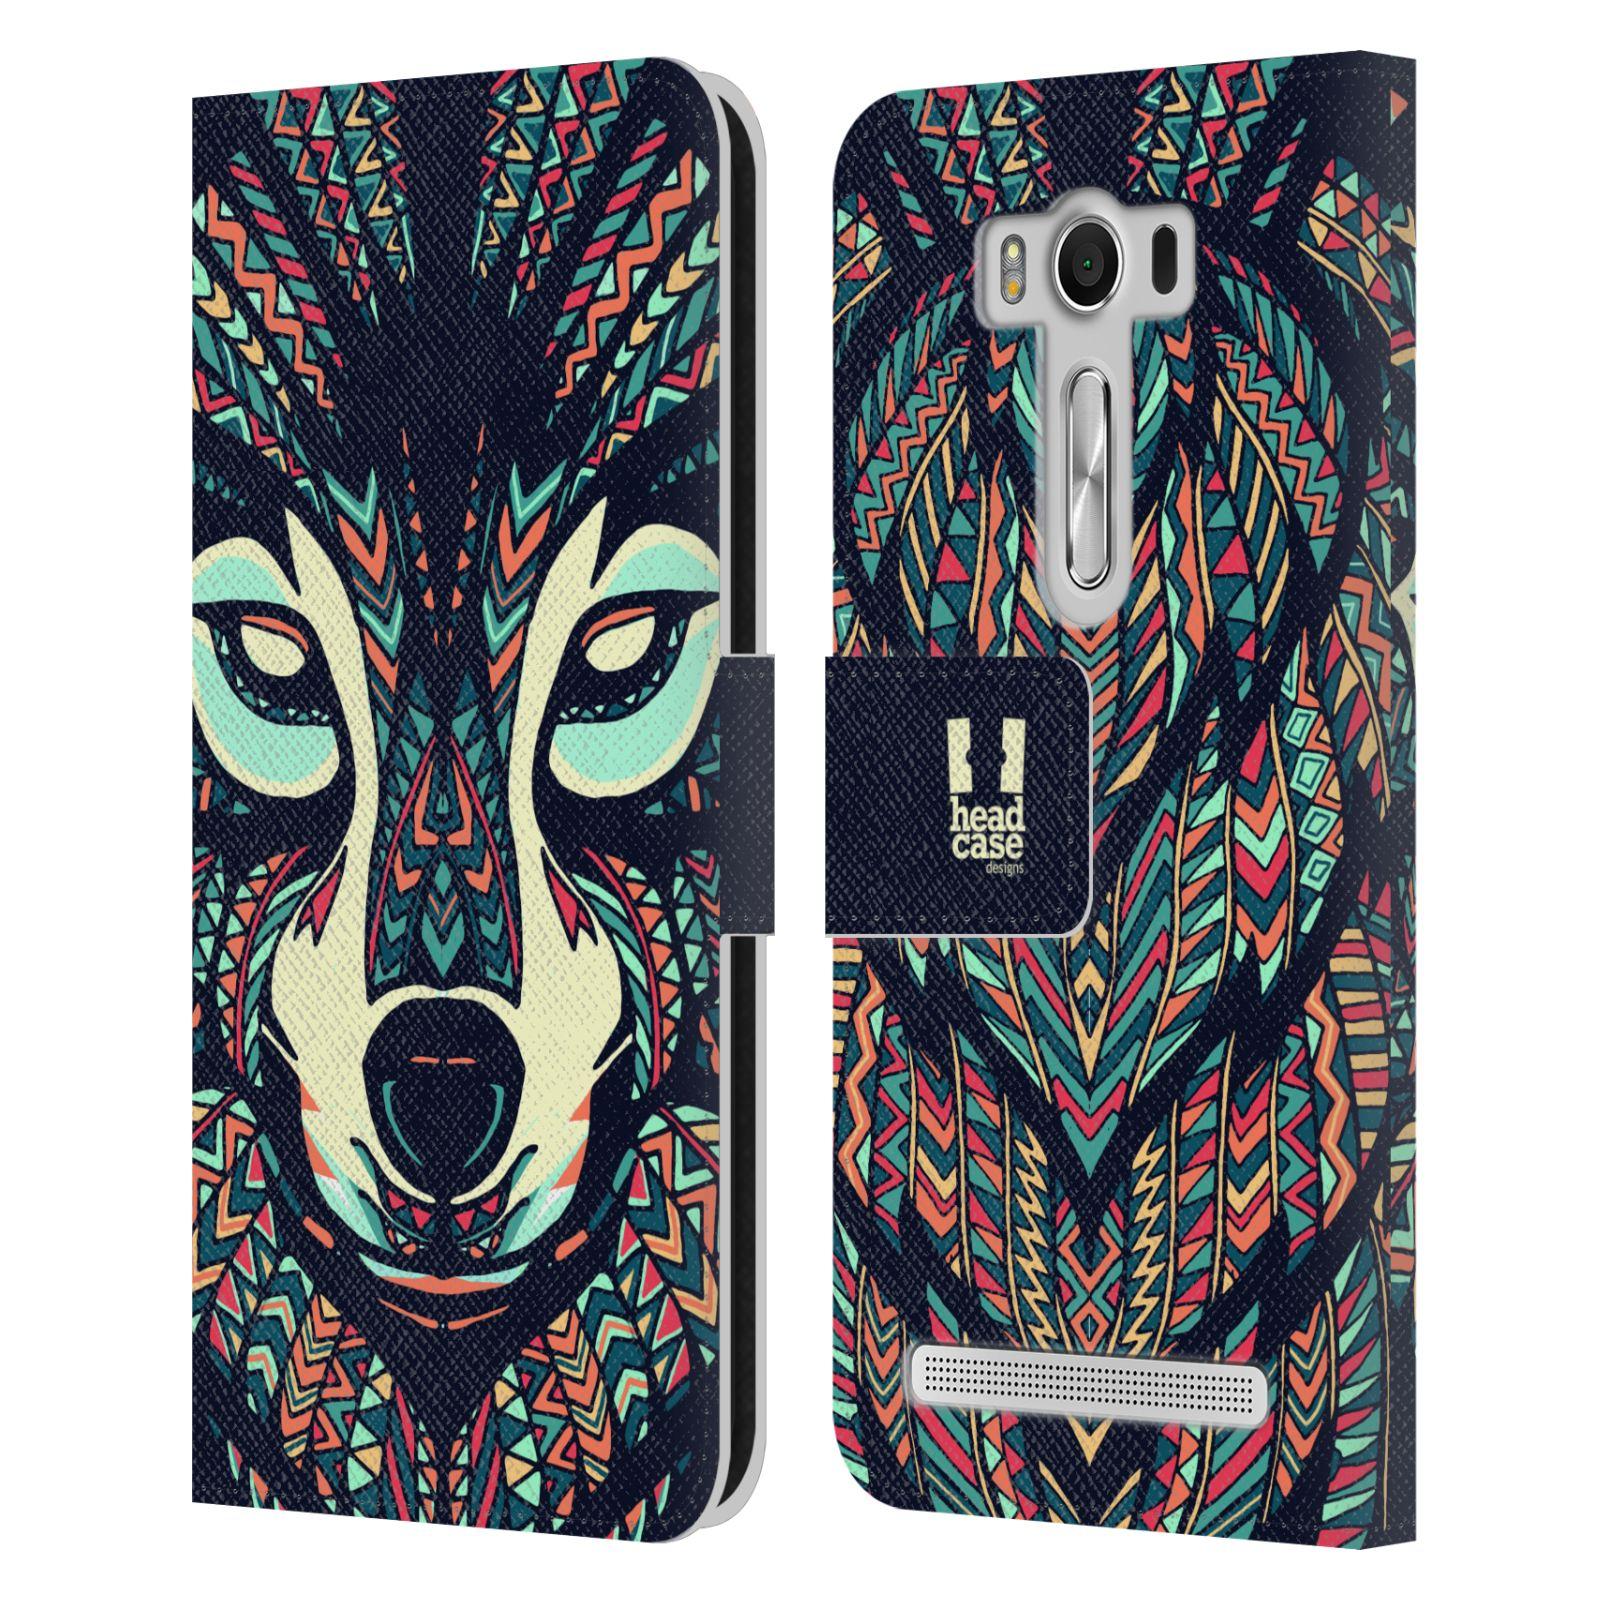 Pouzdro na mobil Asus Zenfone 2 Laser ZE500KL - Head Case - Aztécký vlk